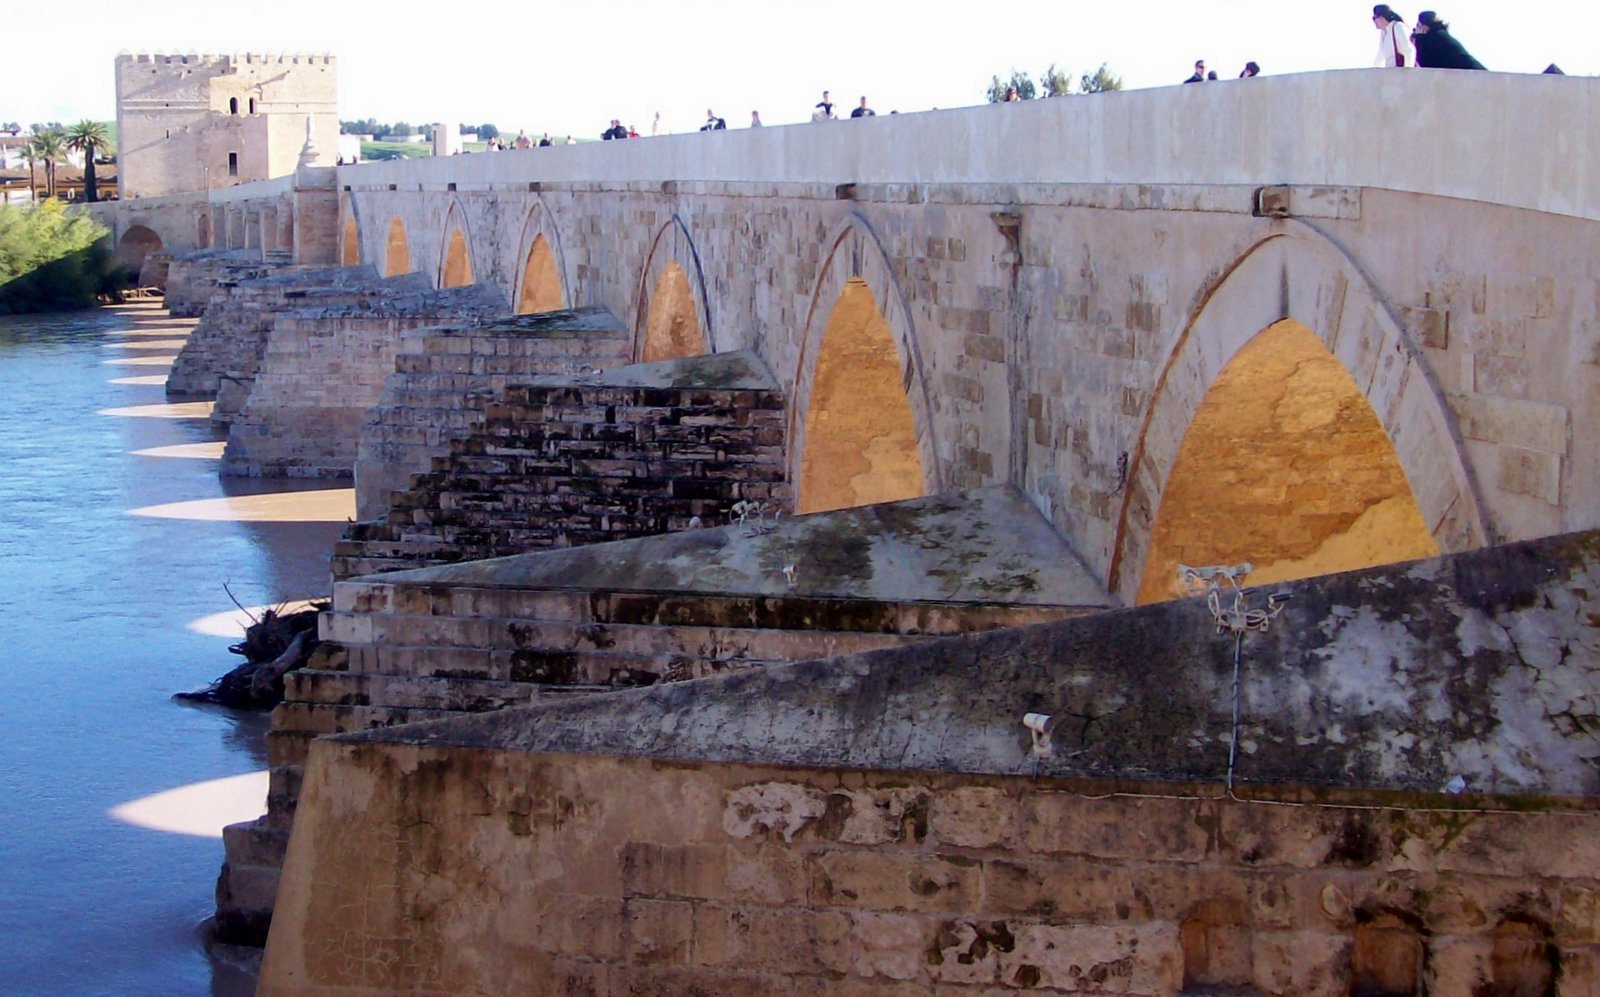 Alte Römische Brücke - Cordoba - Andalusien